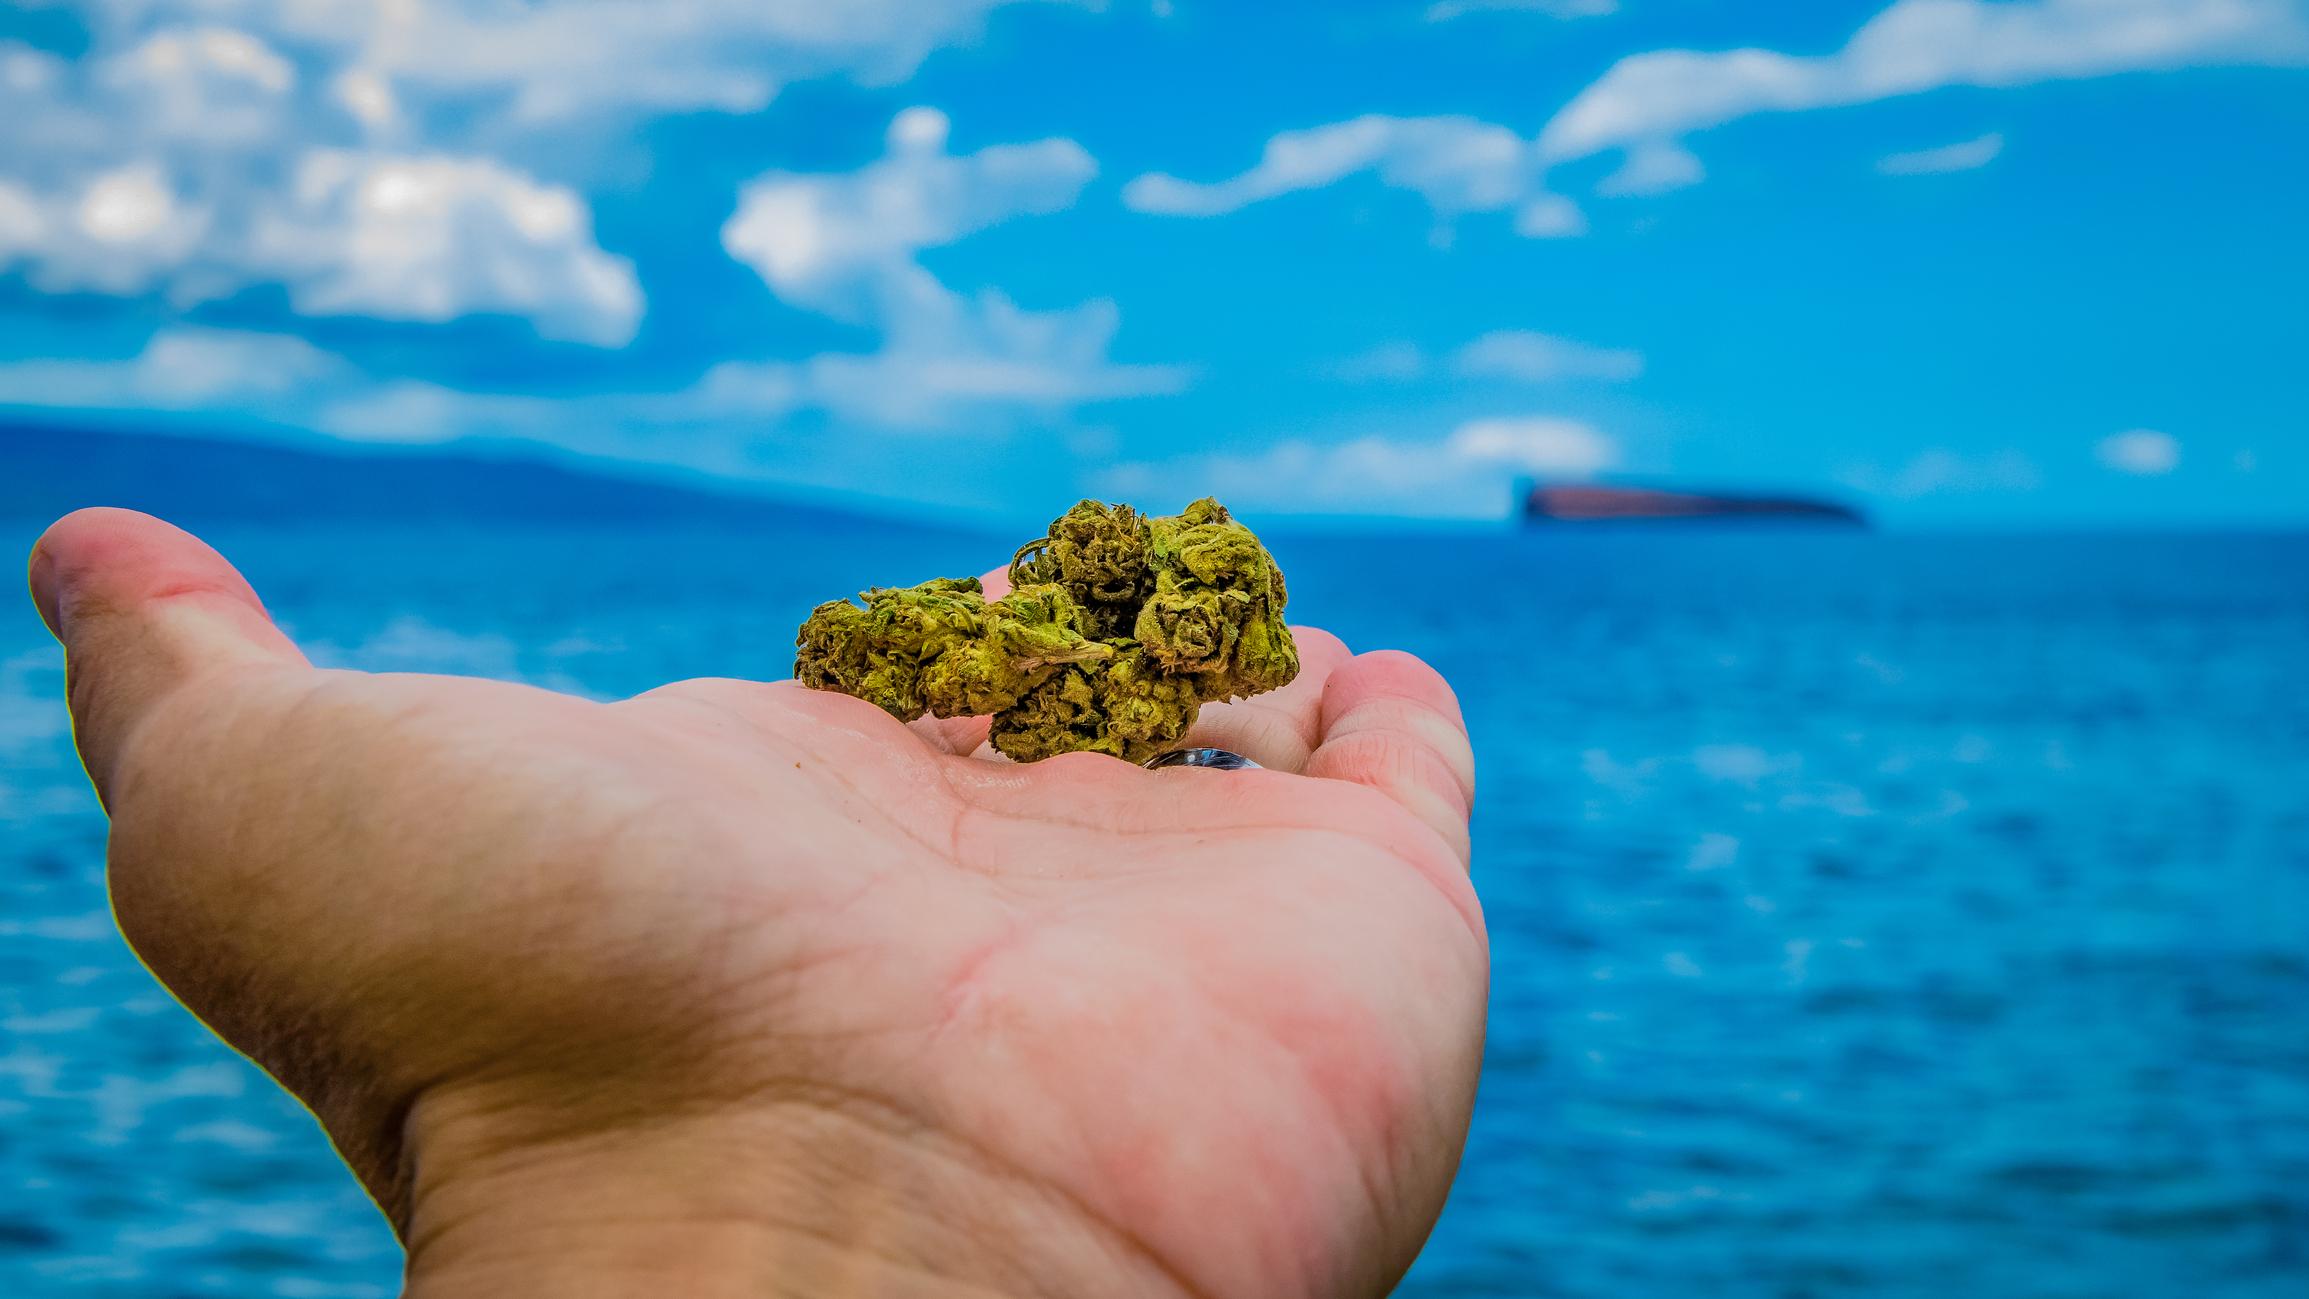 Marijuana buds on palm of hand extended towards ocean